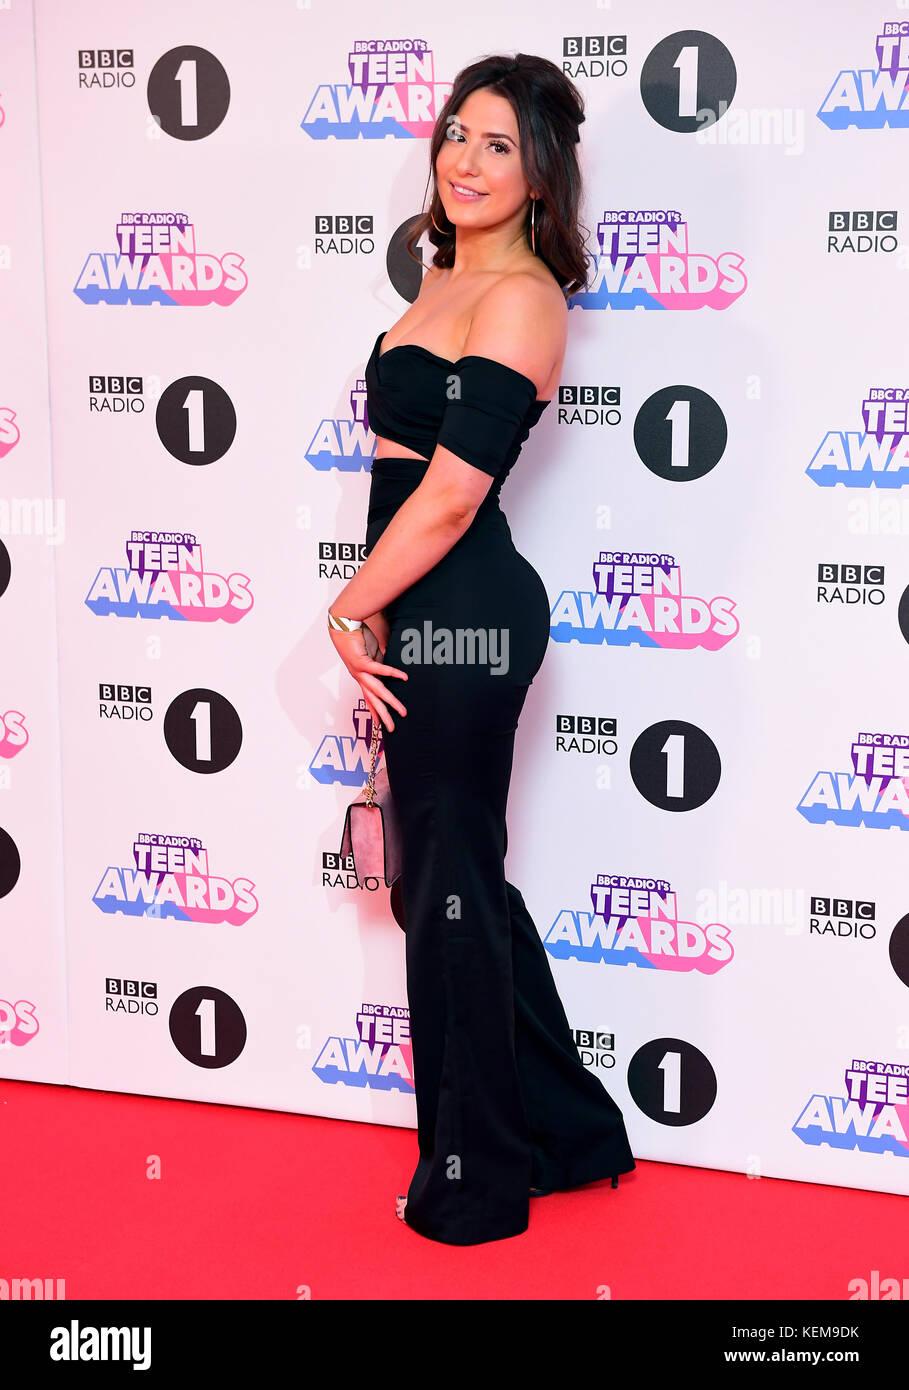 ICloud Jasmine Armfield nudes (17 photos), Tits, Bikini, Boobs, legs 2018